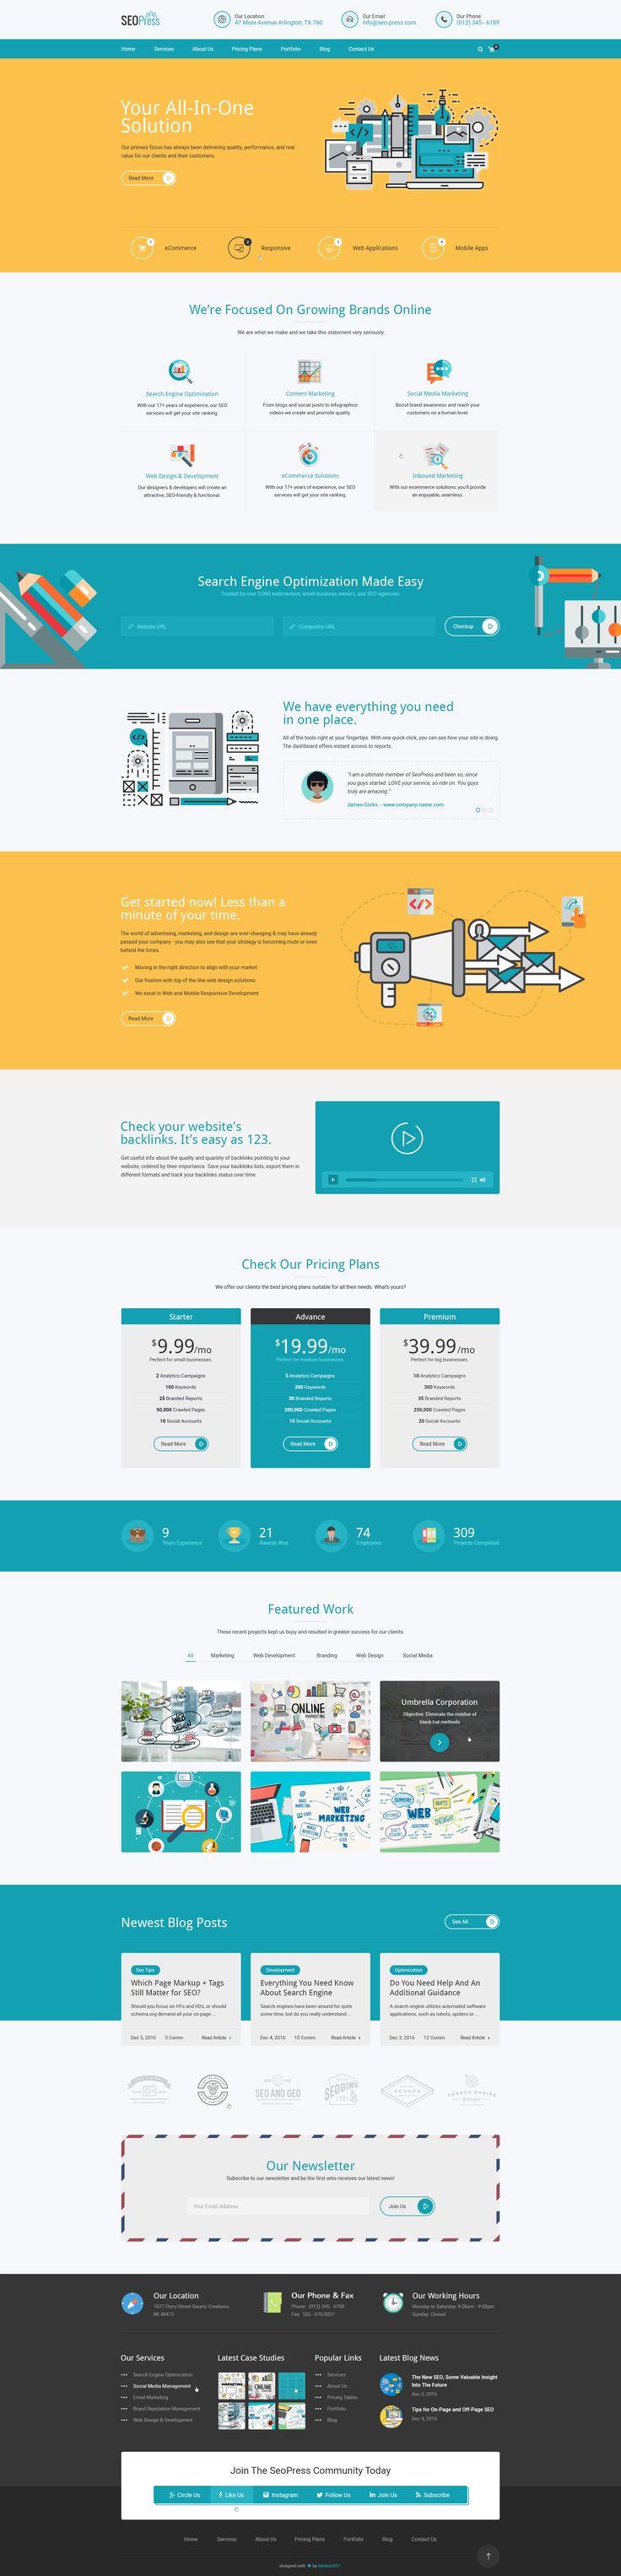 SeoPress Seo u0026 Digital Marketing Agency